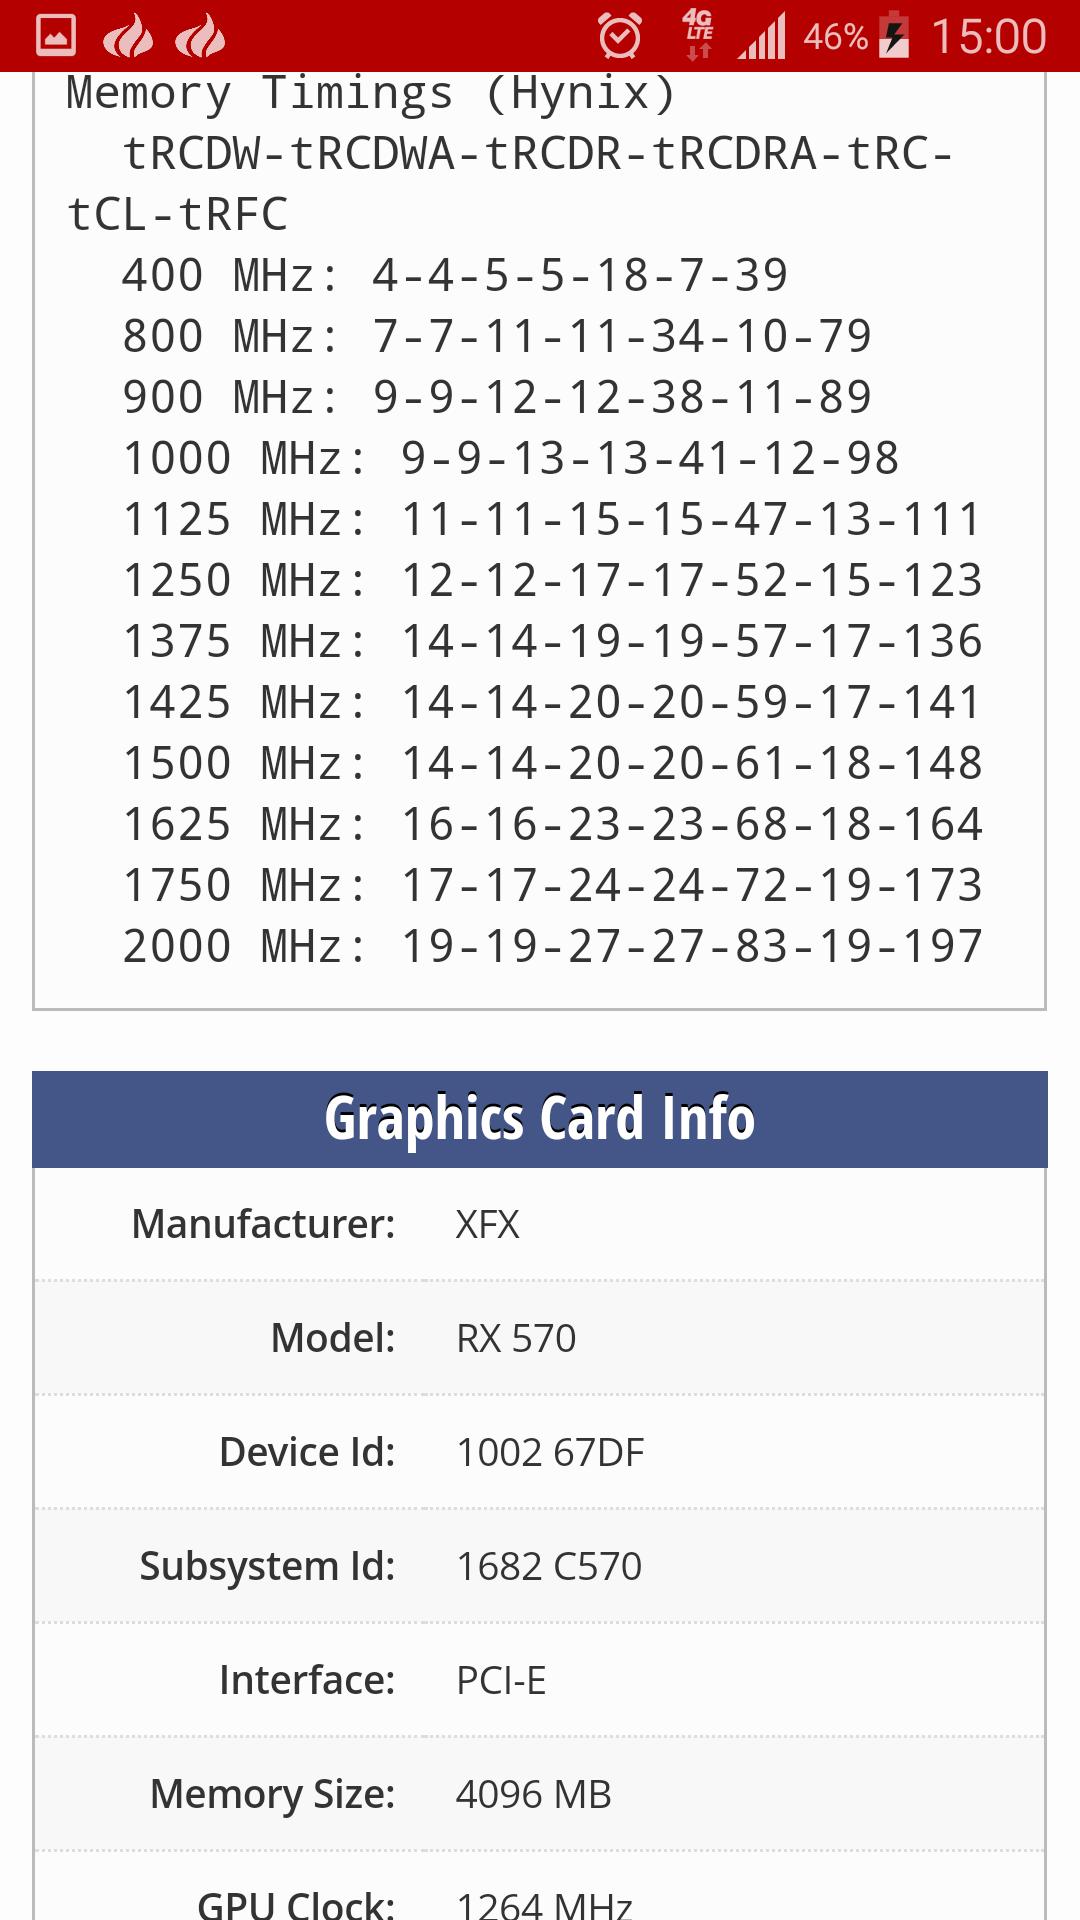 Screenshot_2020-03-25-15-00-03.png